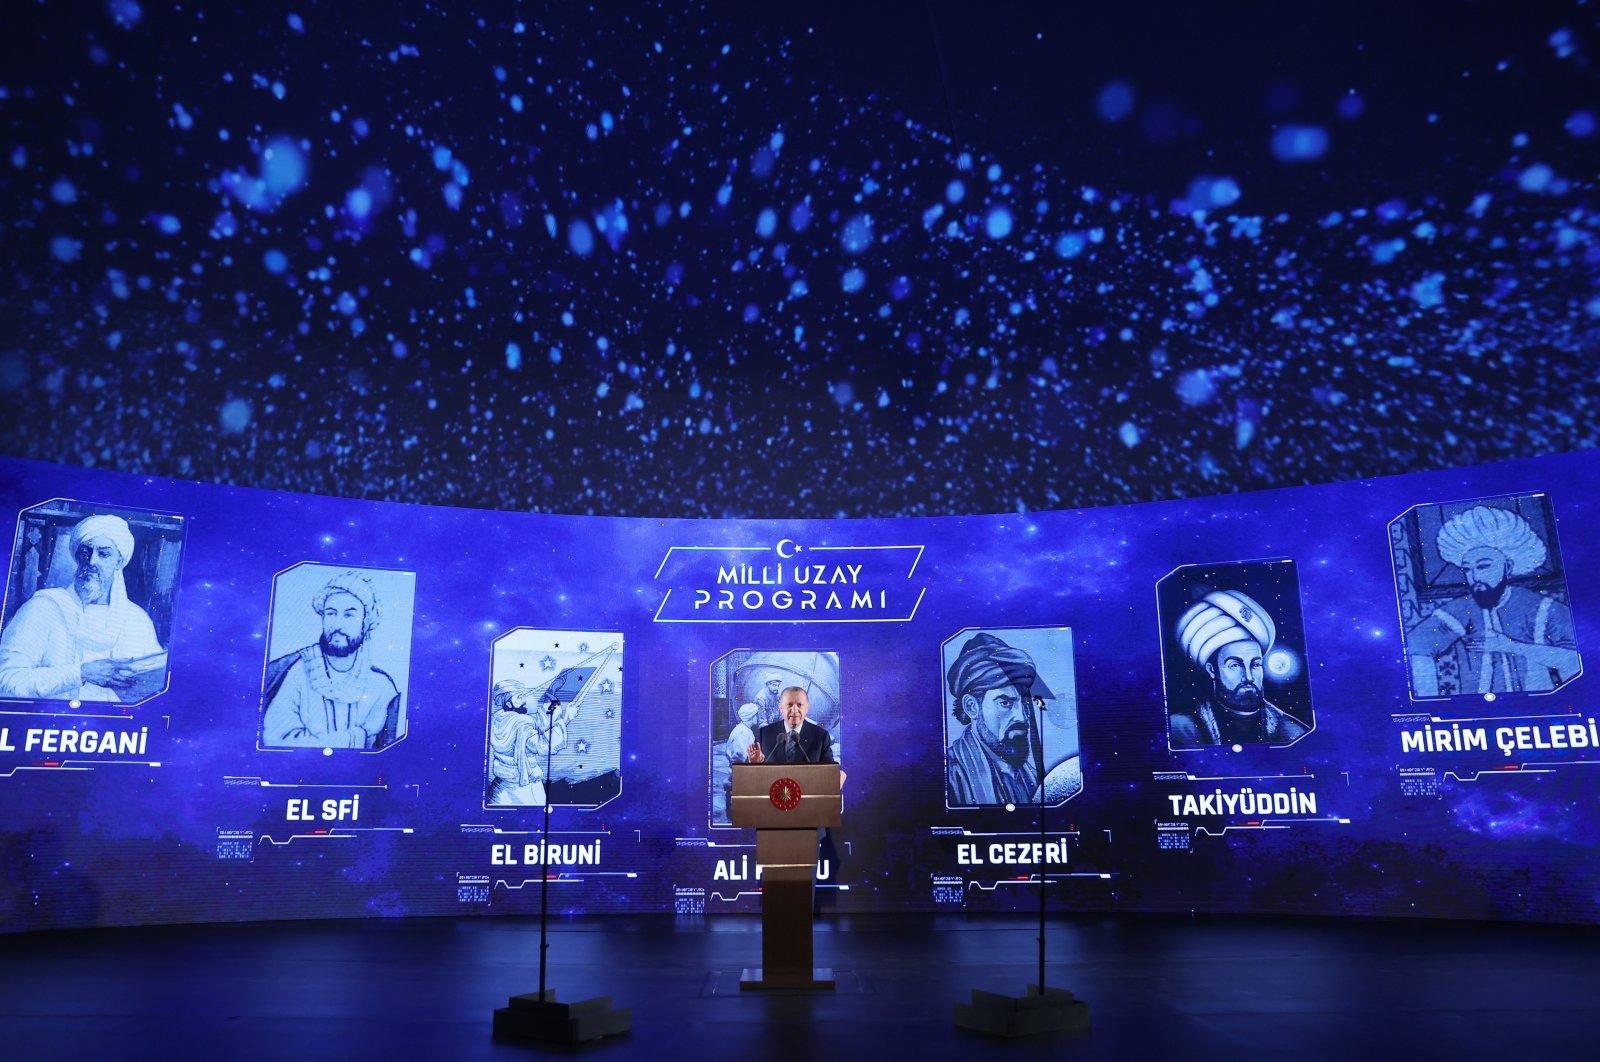 President Recep Tayyip Erdoğan speaks during the inauguration ceremony of Turkey's National Space Program in the capital Ankara, Turkey, Feb. 9, 2021. (AA Photo)